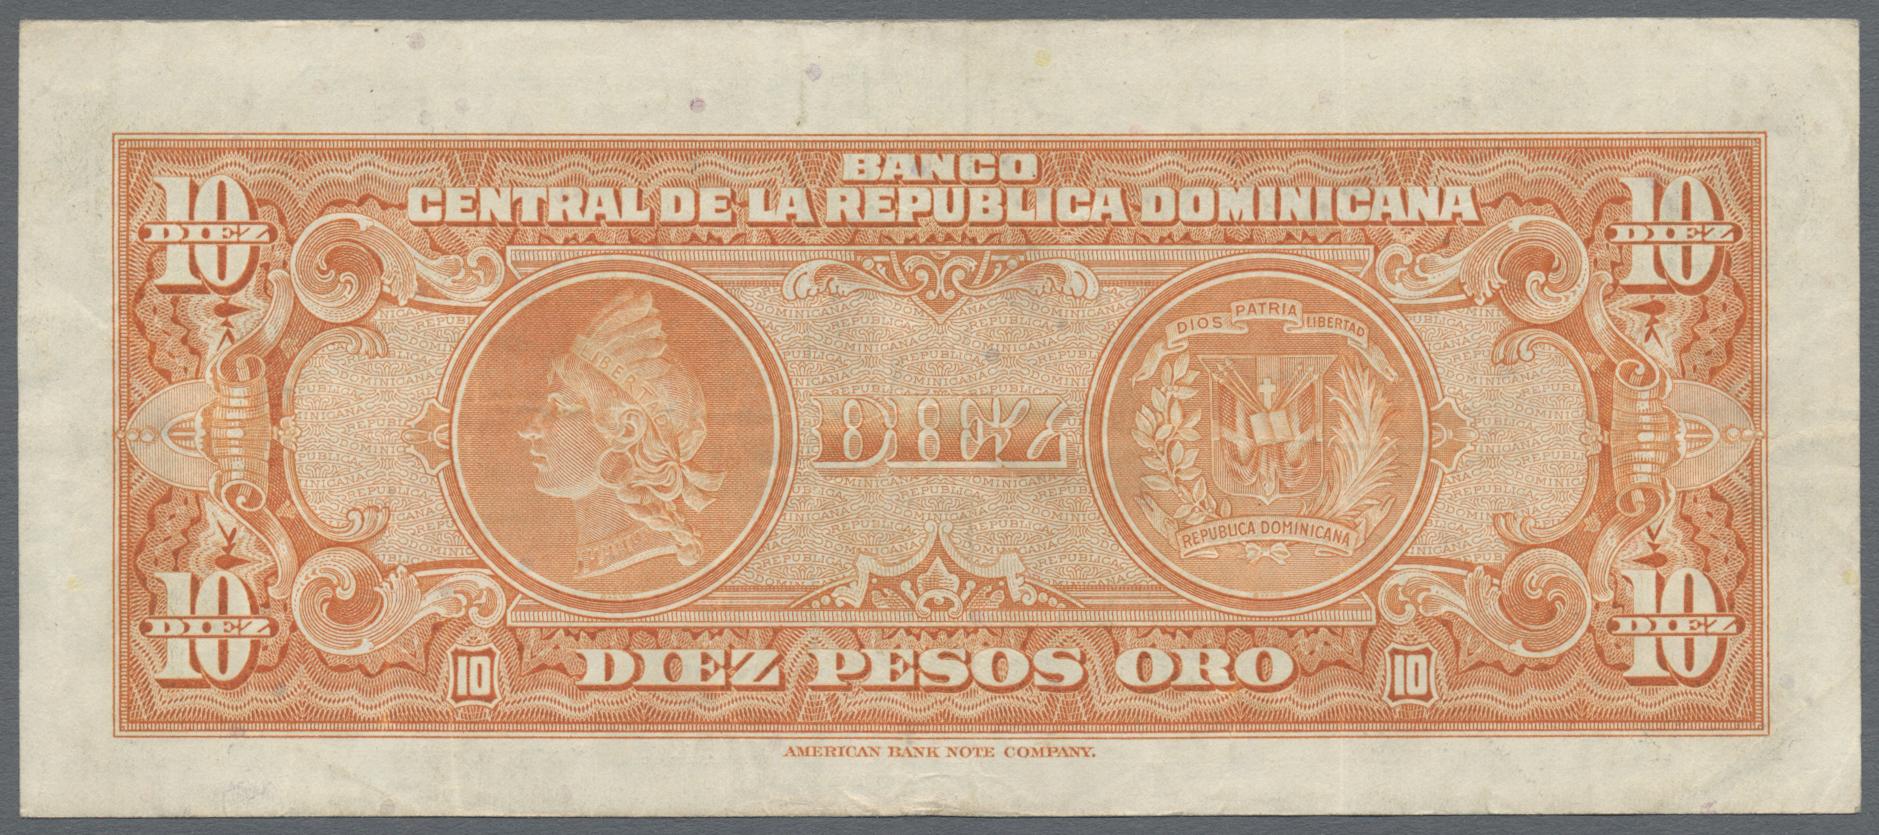 Lot 8352 - Dominican Republic / Dominikanische Republik banknoten -  Auktionshaus Christoph Gärtner GmbH & Co. KG Sale #47 Banknotes Worldwide & Germany, Numismatics